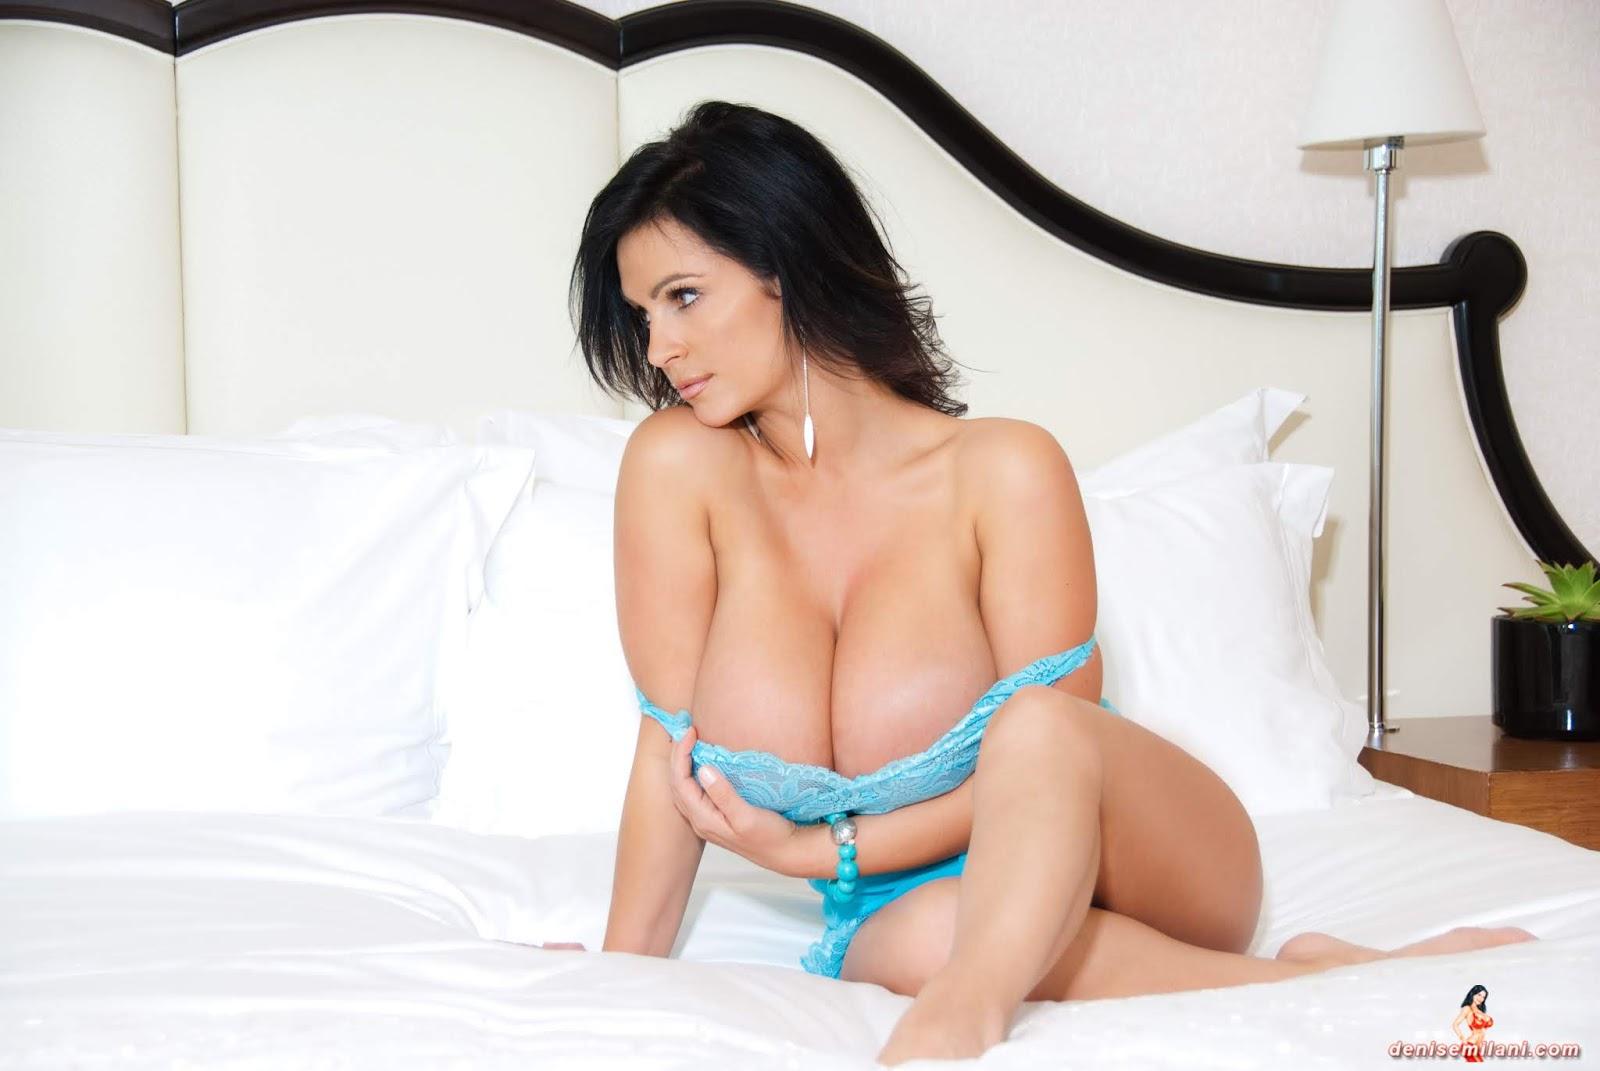 Denise milani strip videos